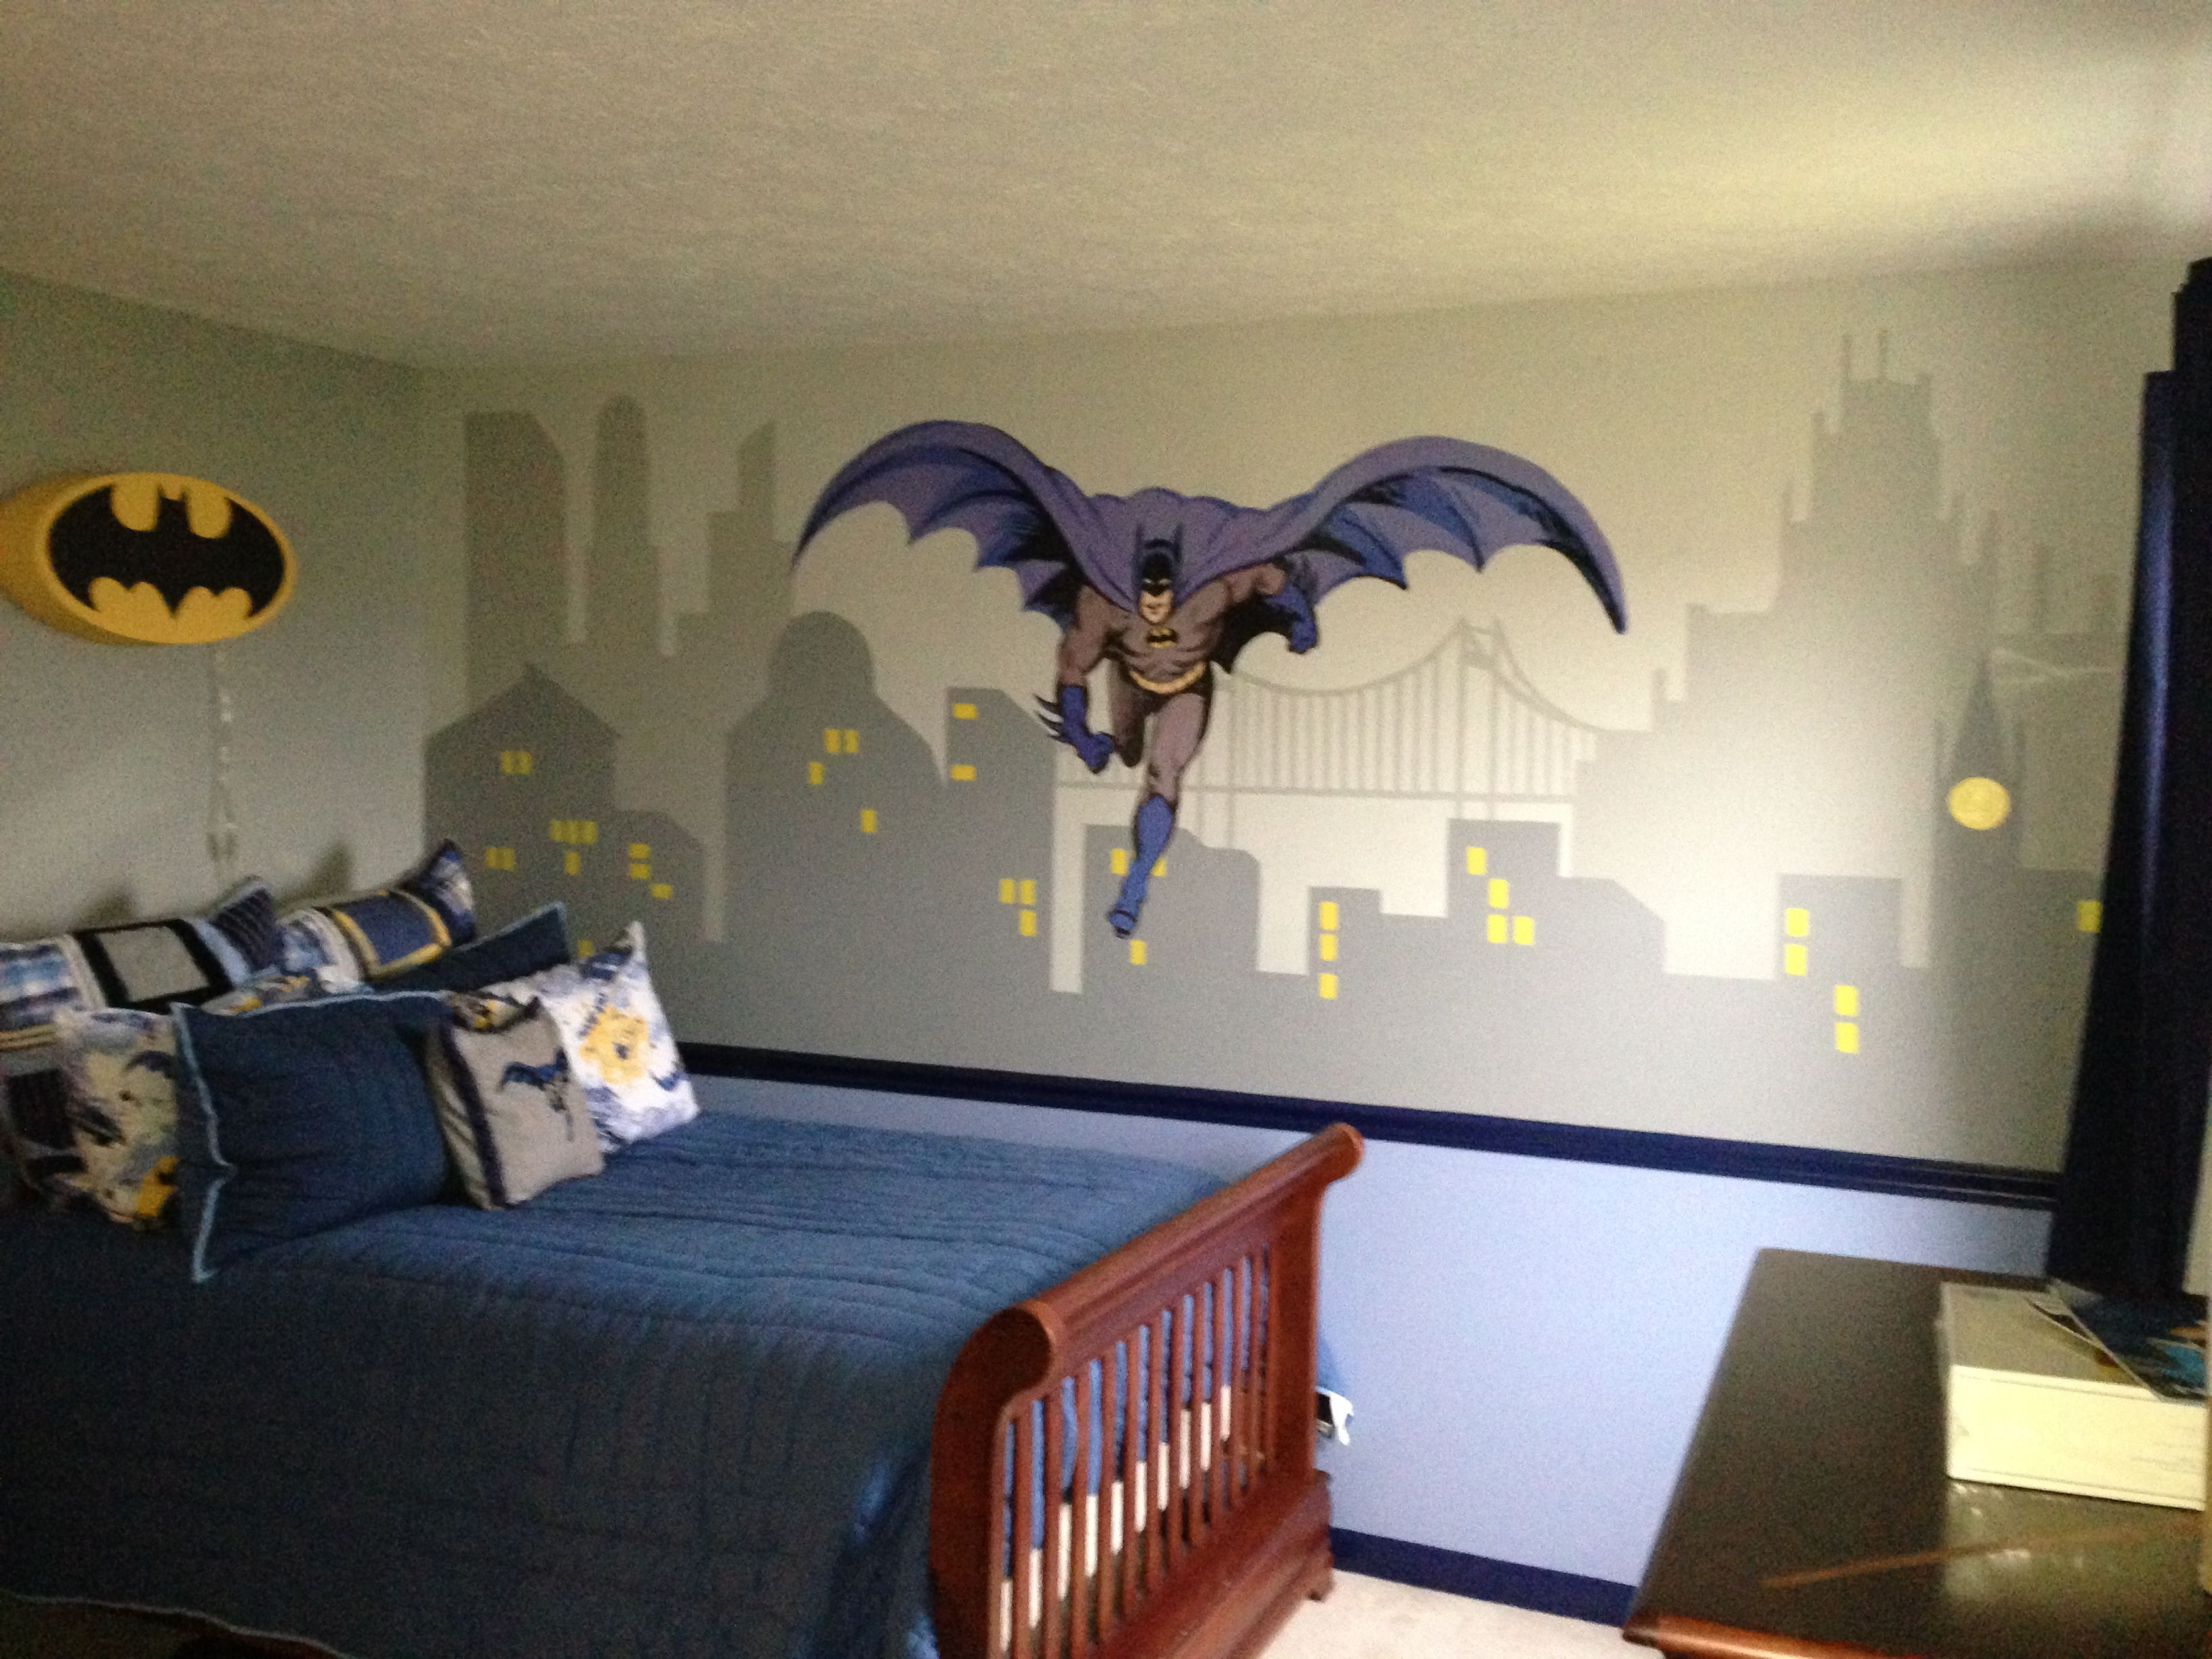 pottery barn kids batman theme bedroom kids room decor pinterest rh pinterest ph batman kids room ideas